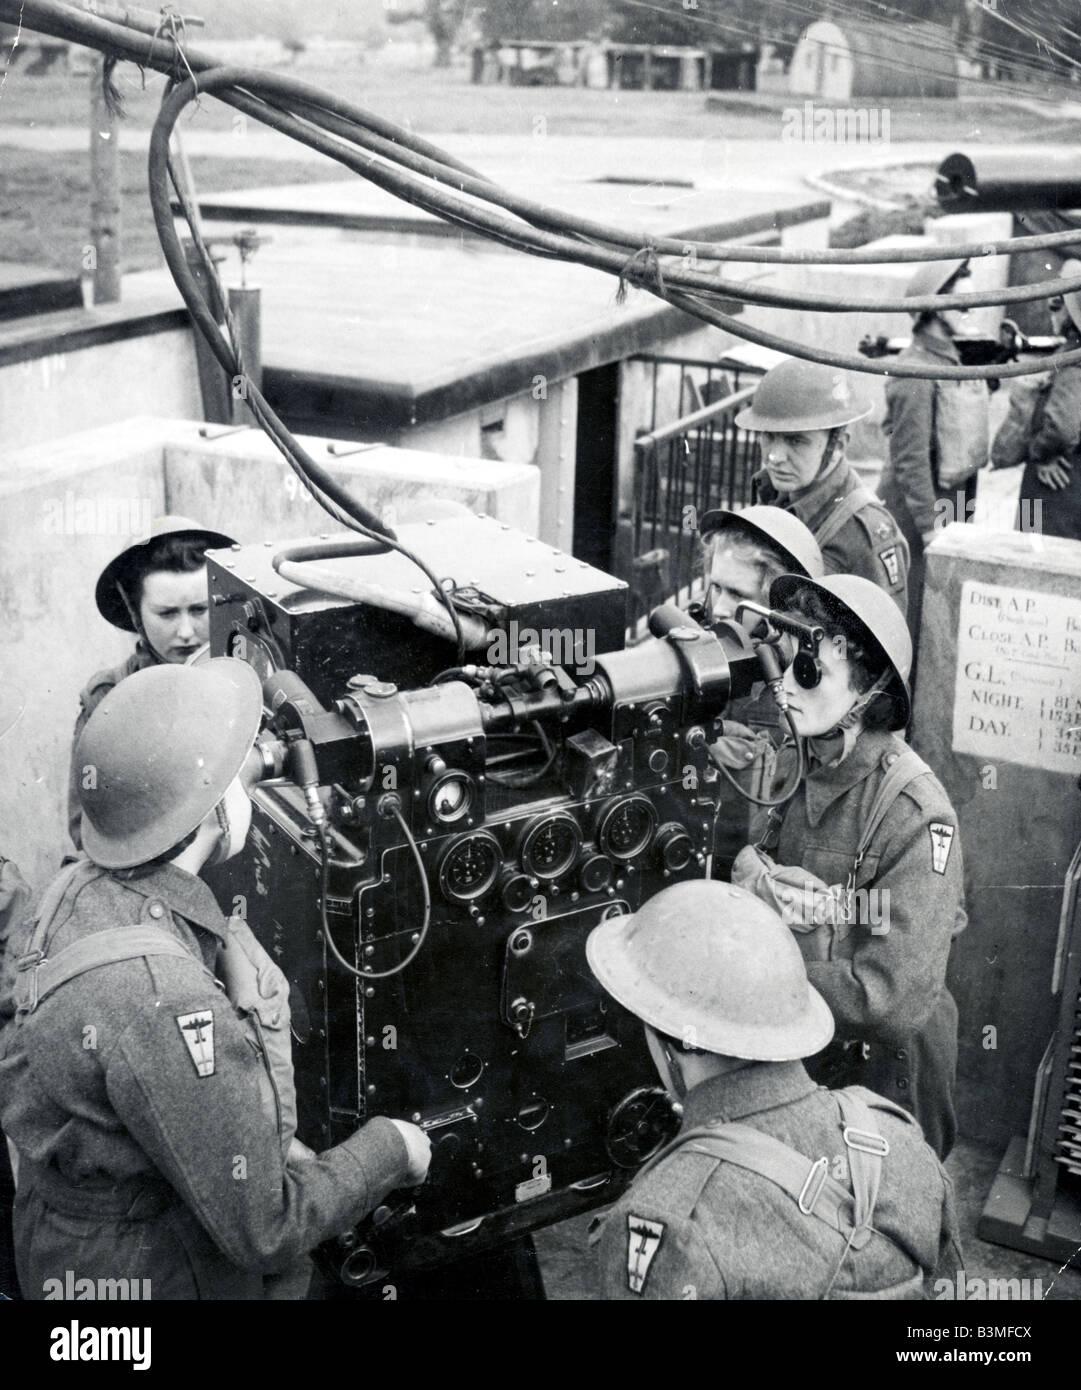 BRITISH WAAFS (Womens Army Air Force) training on radar-predicted anti-aircraft guns during WW2. - Stock Image